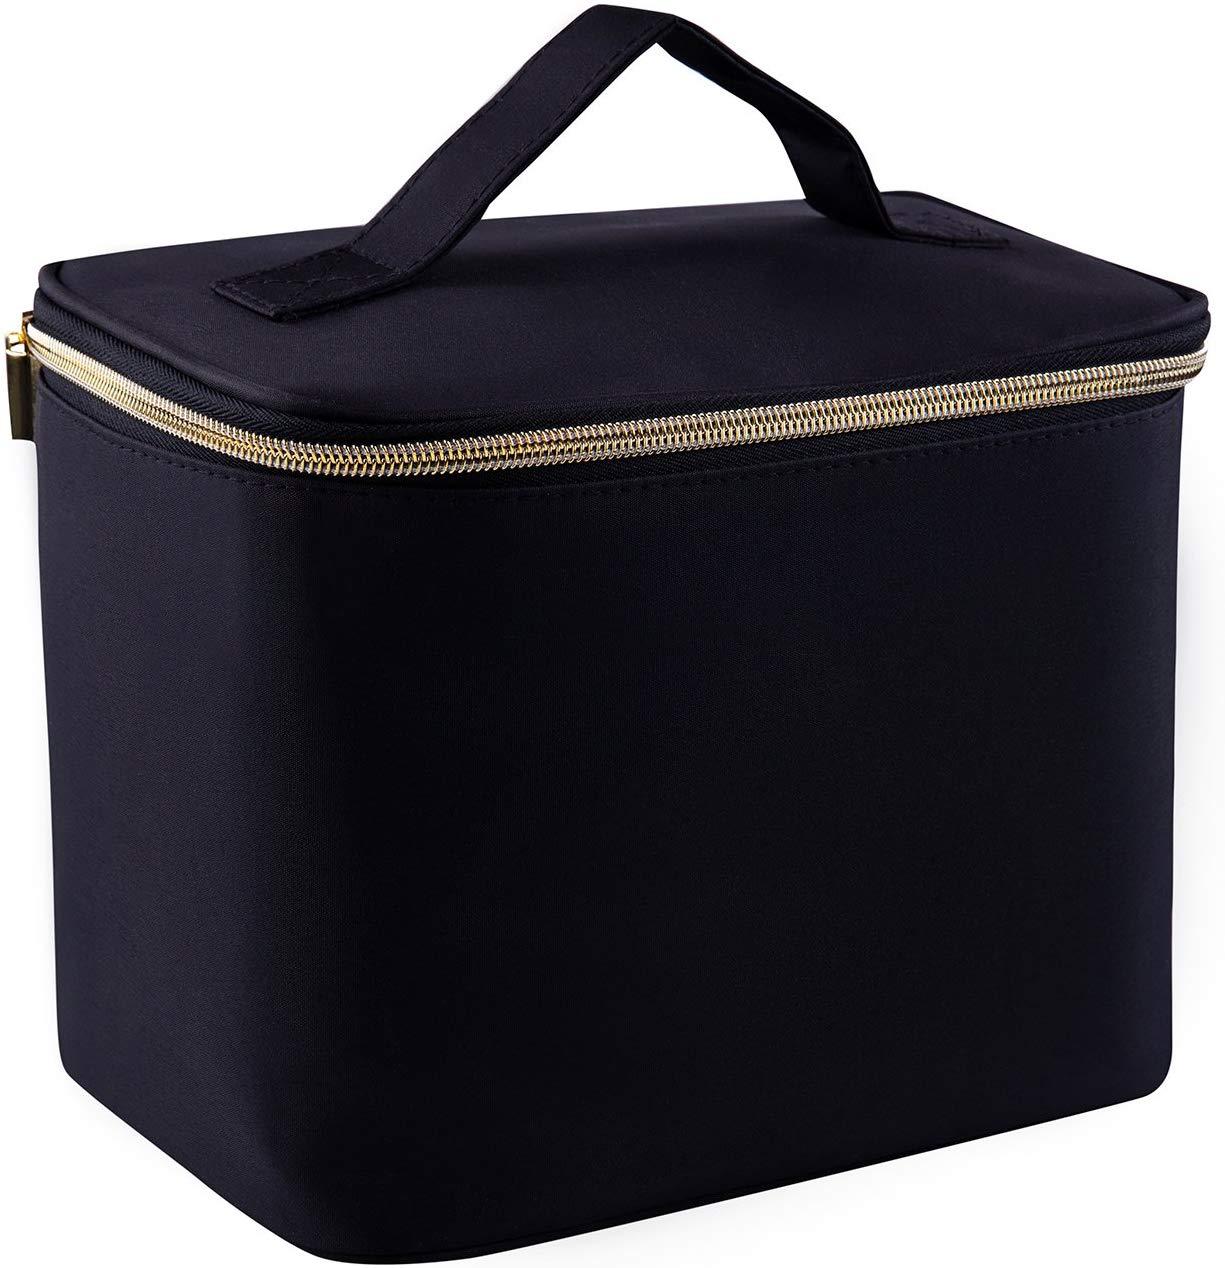 EveBird Travel Make Up Bag Organiser – Black Cosmetic Vanity Case – Toiletry Bags